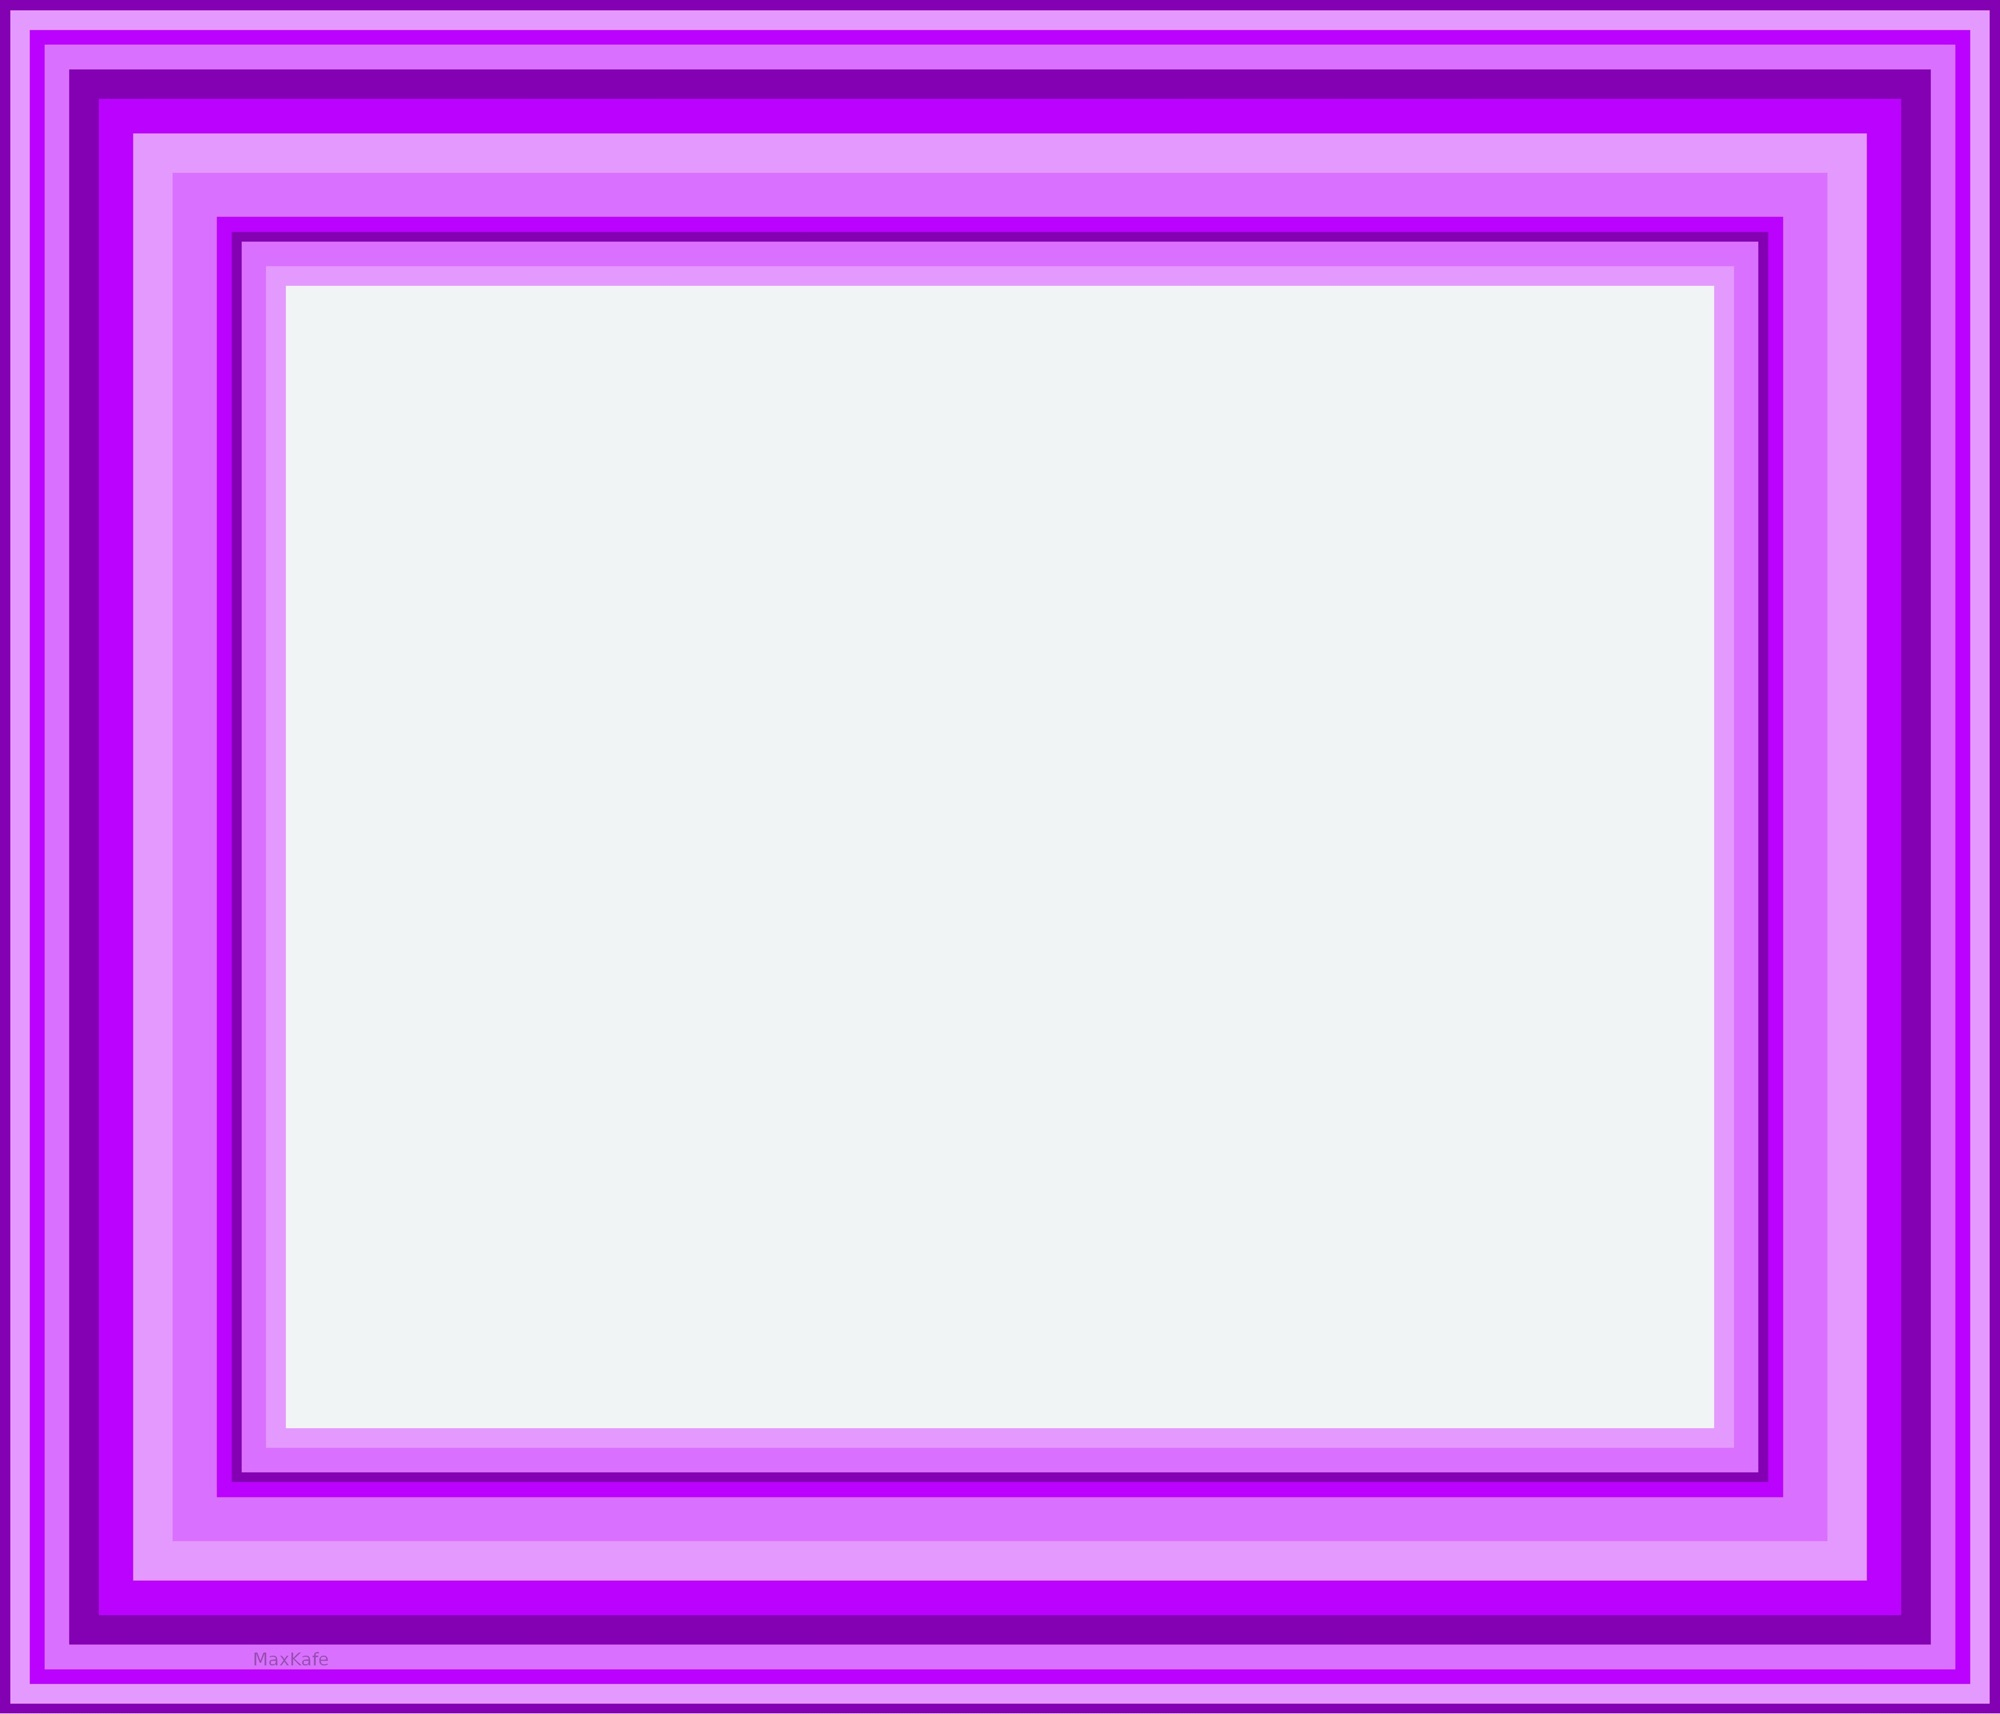 "MK16LFS123 Frame 6x7 Lilac <a href=""https://dl.orangedox.com/iNEdS8"">[DOWNLOAD]</a>"